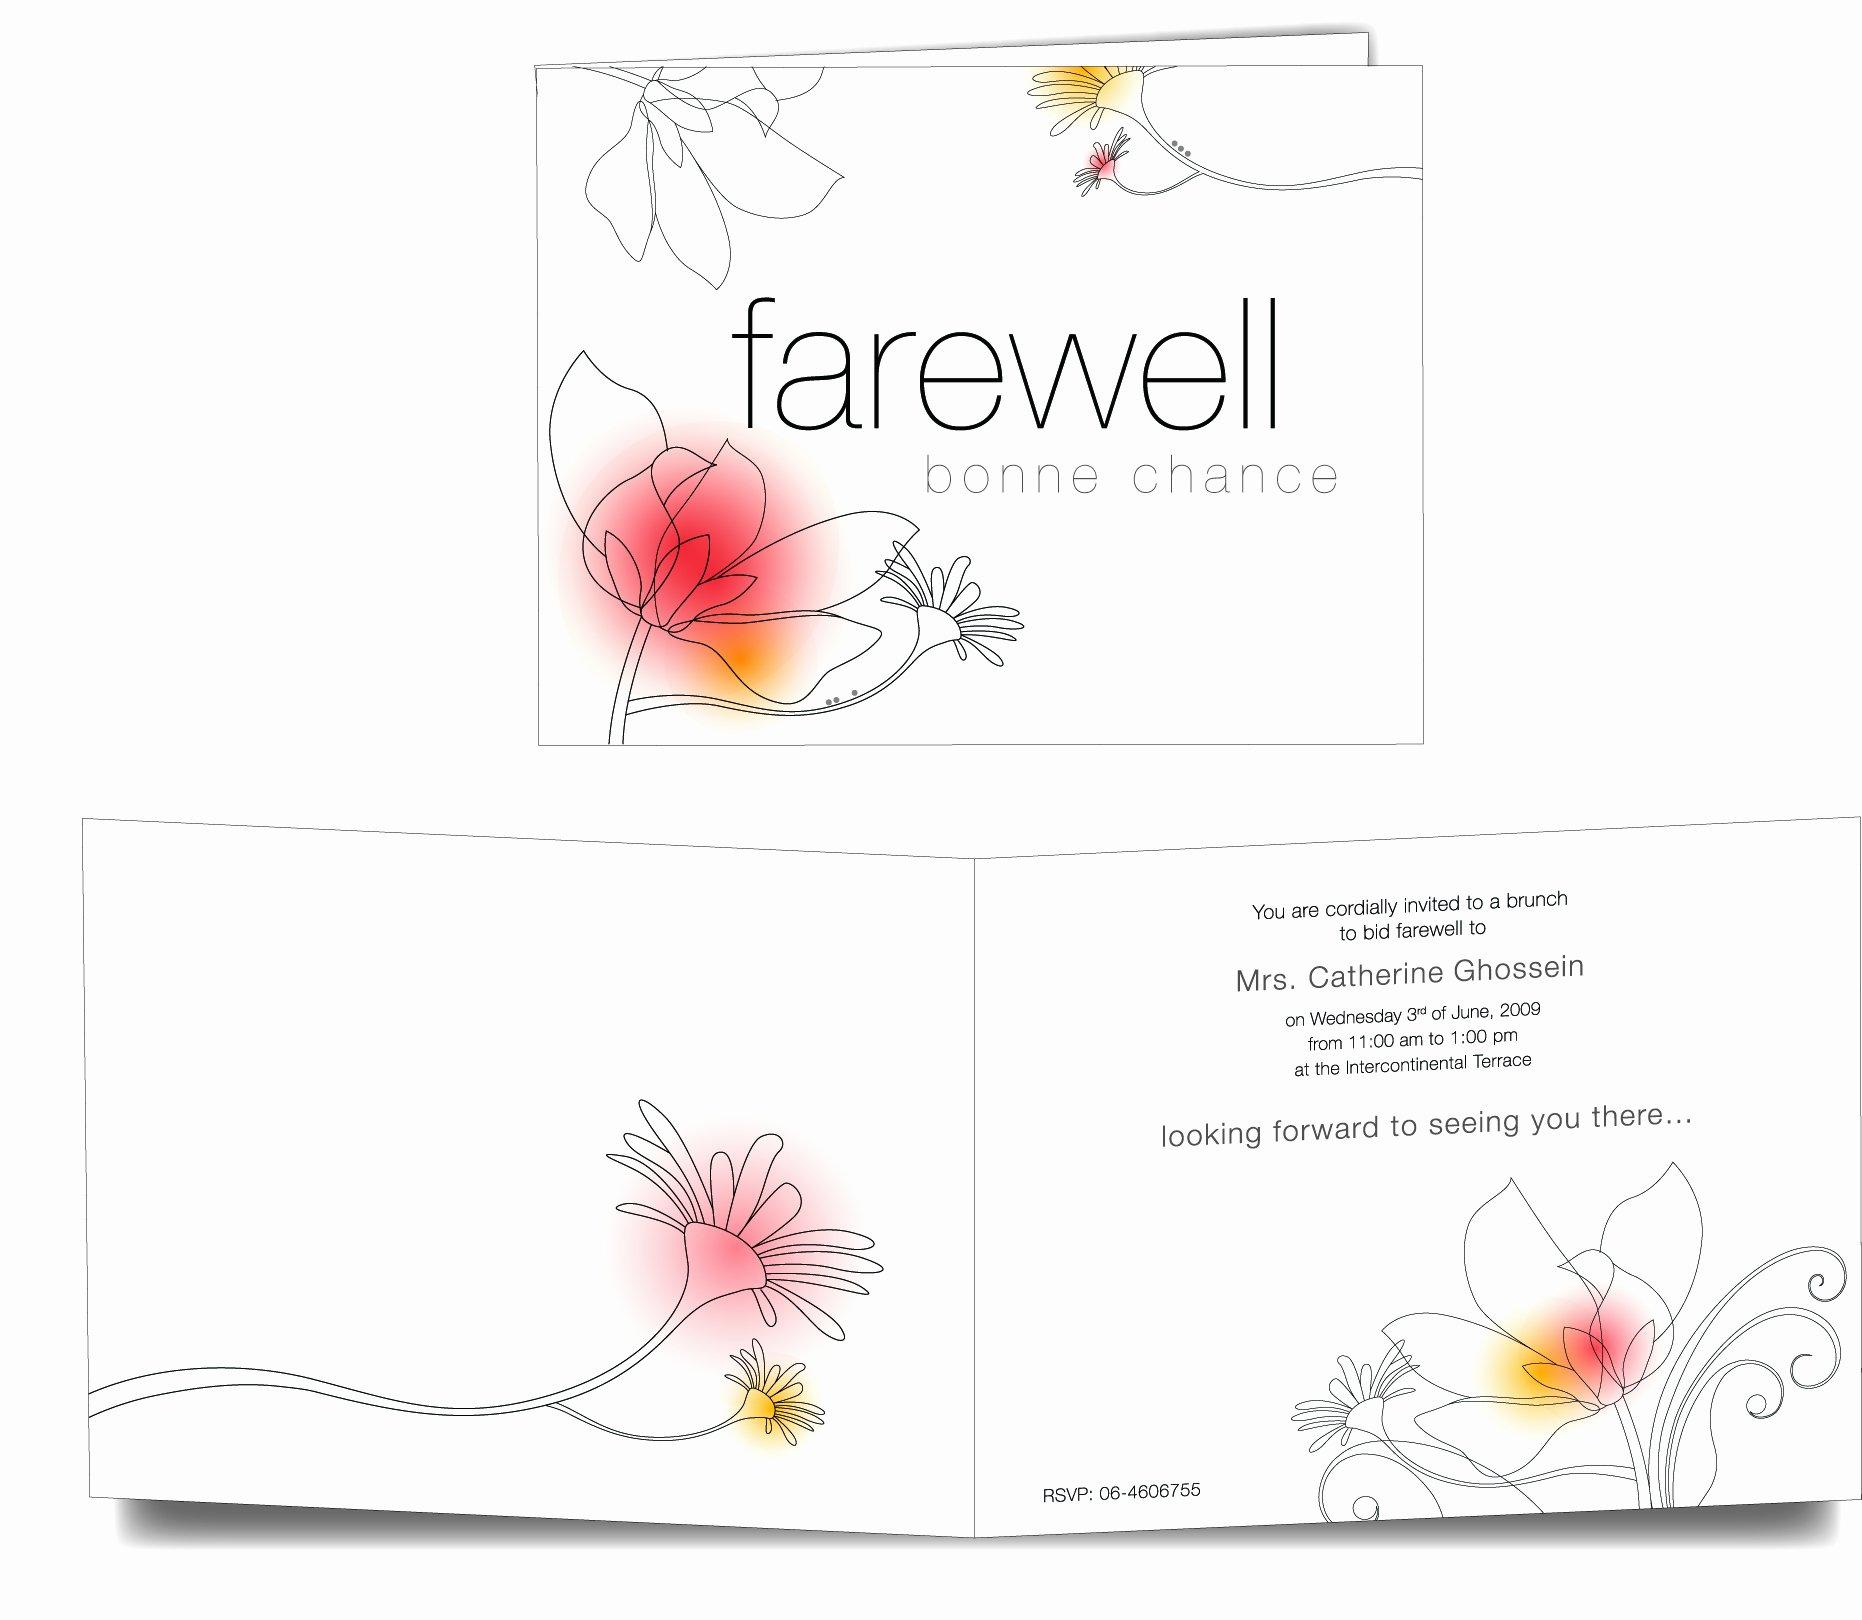 Free Farewell Invitation Template Unique Farewell Card Template 23 Free Printable Word Pdf Psd